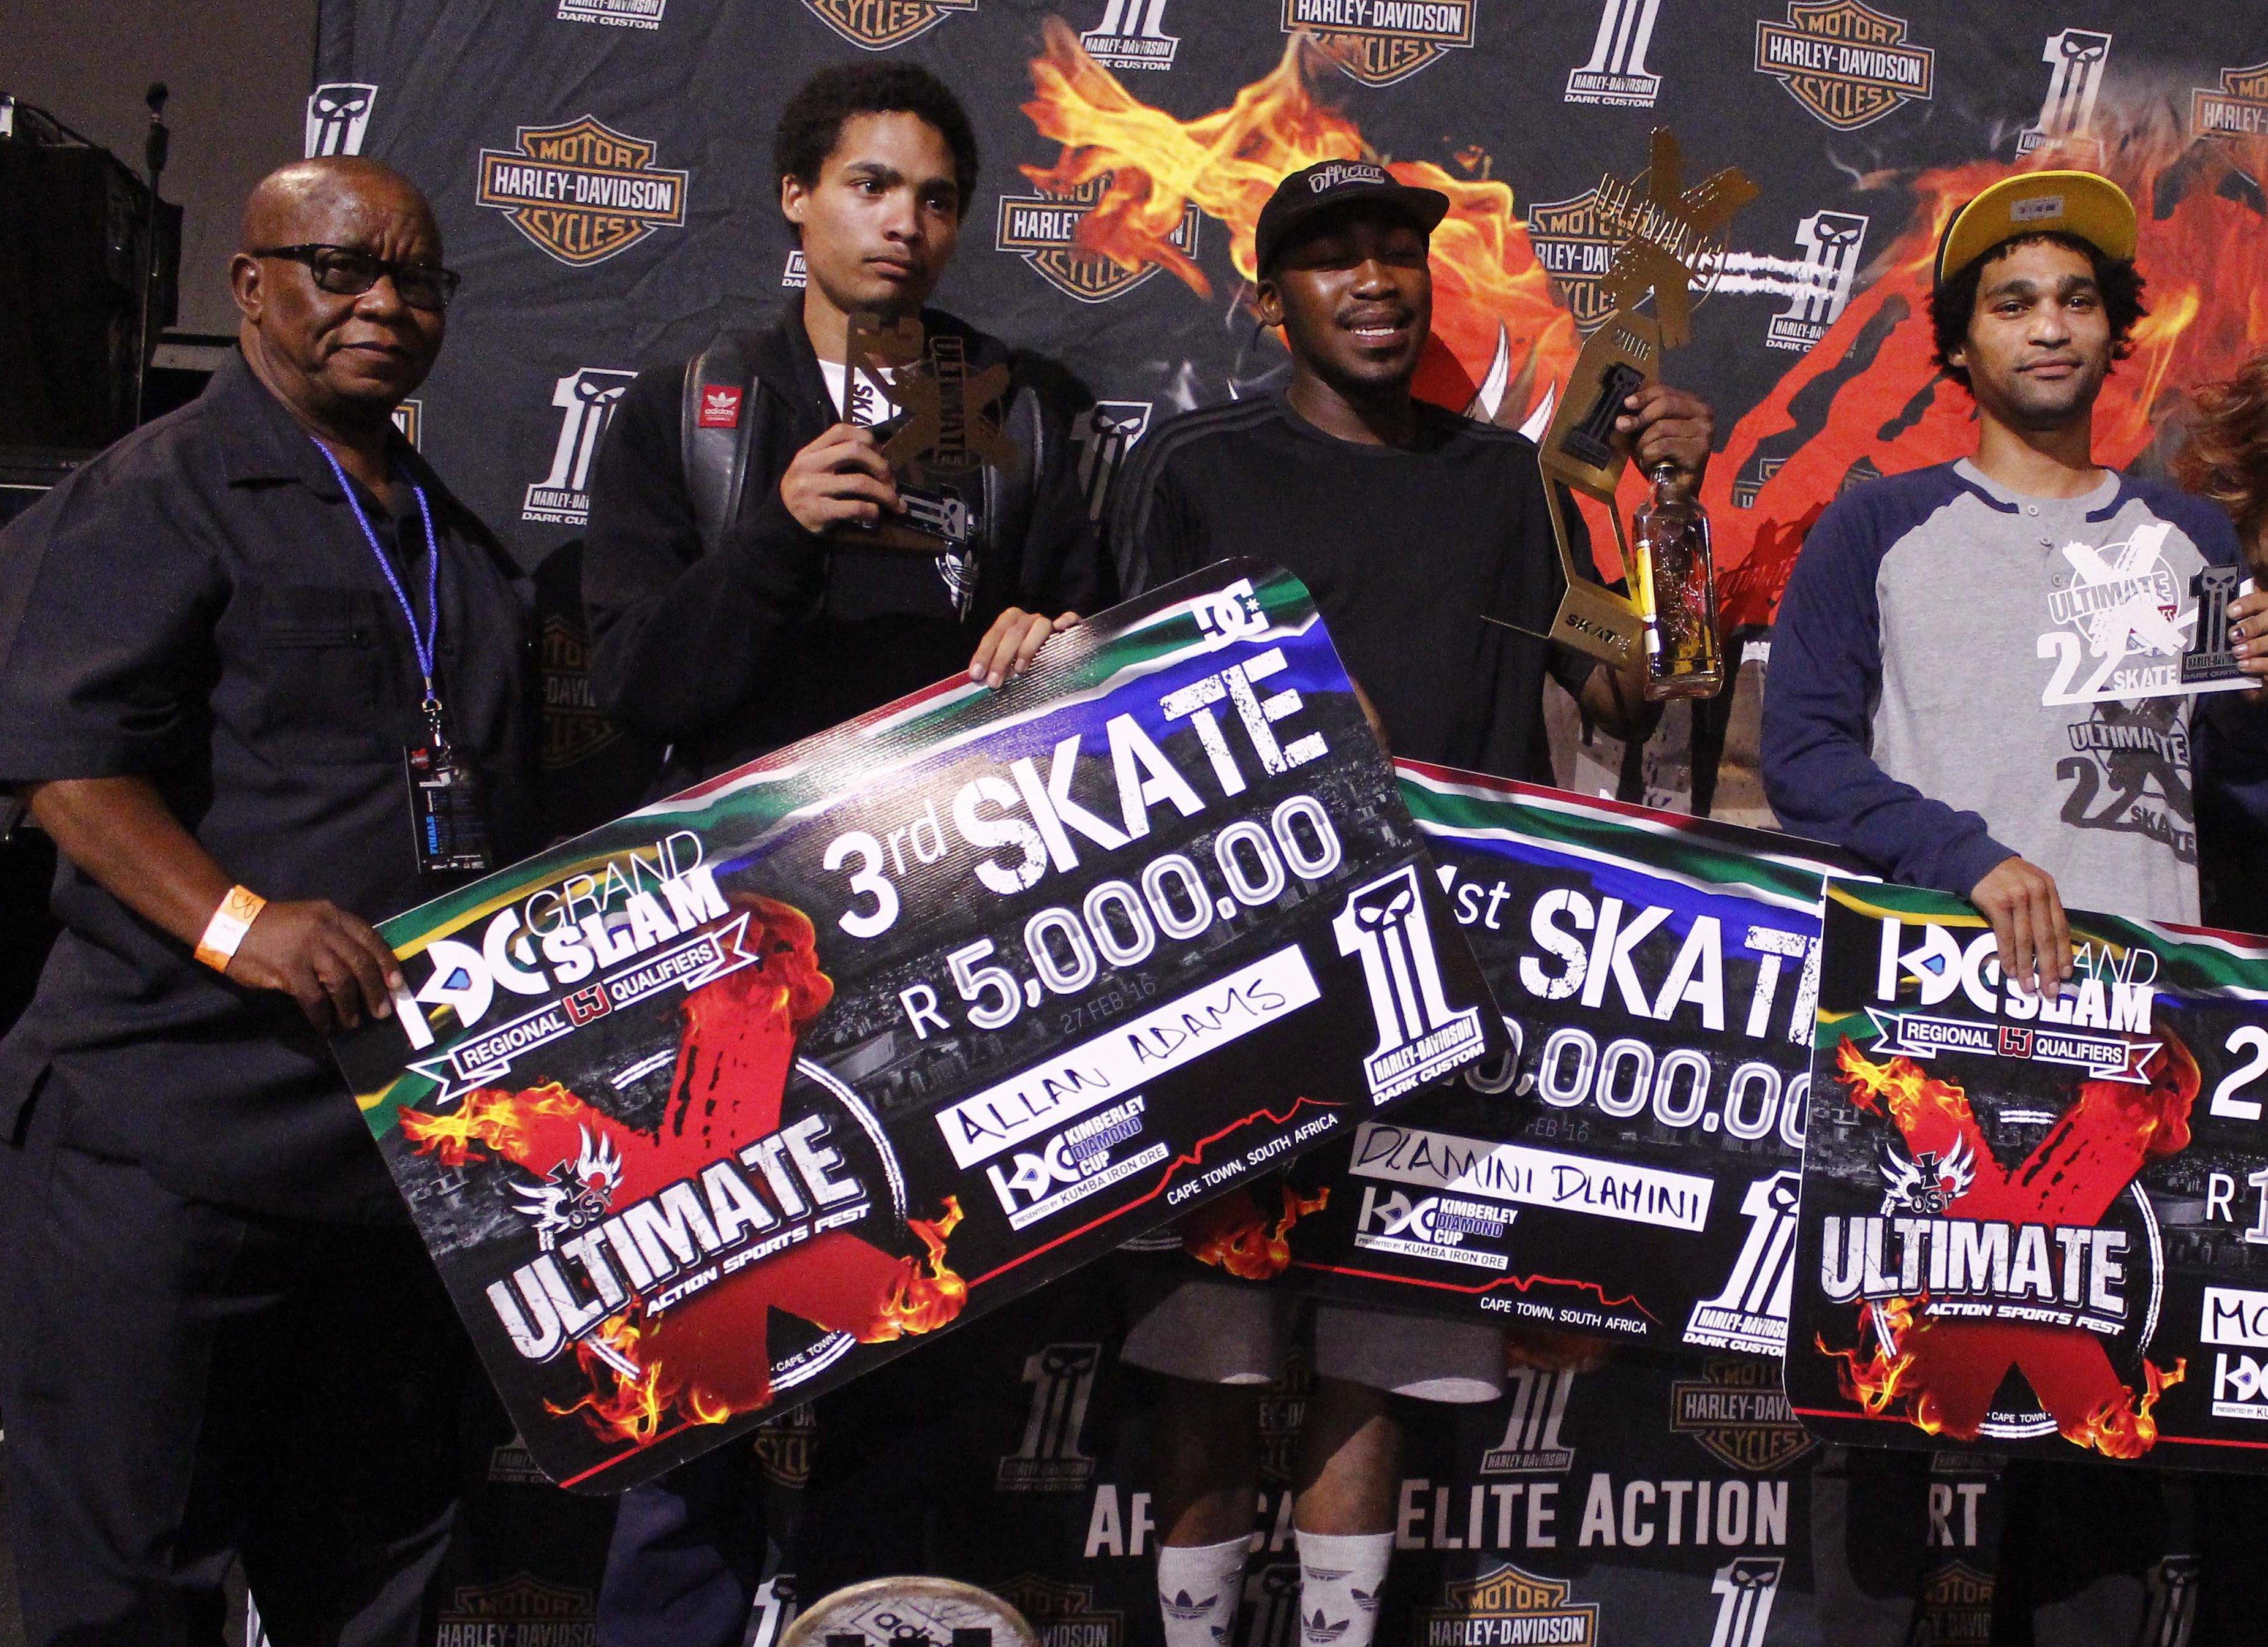 KDC Grand Slam at UltimateX